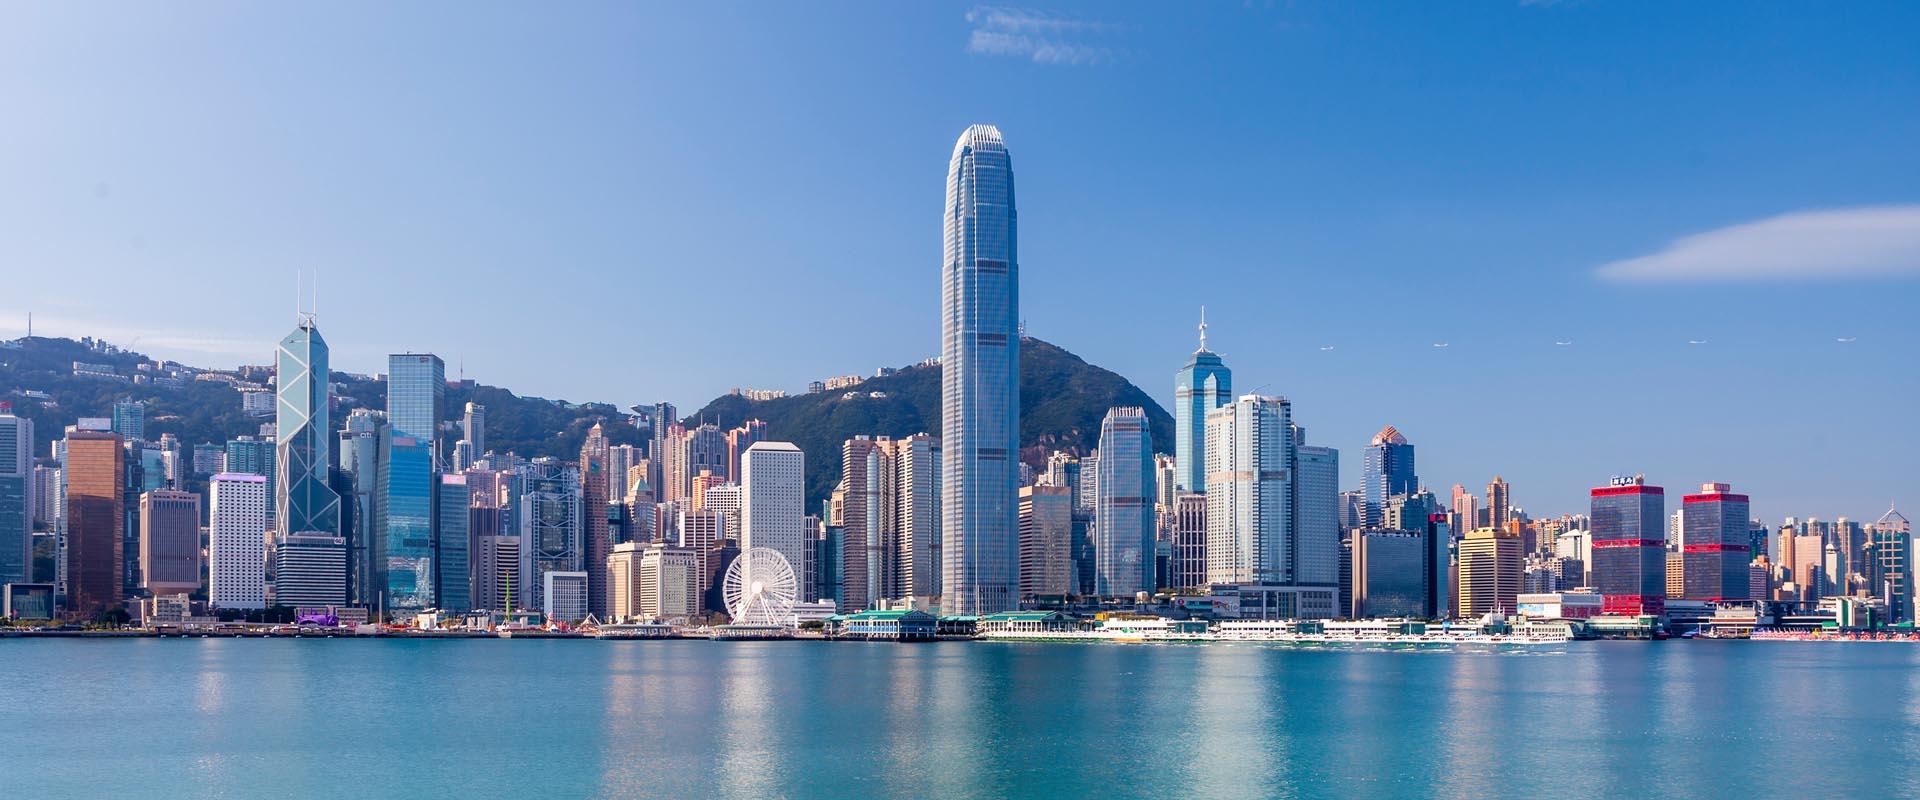 hong kong public holidays 2019 publicholidays hk